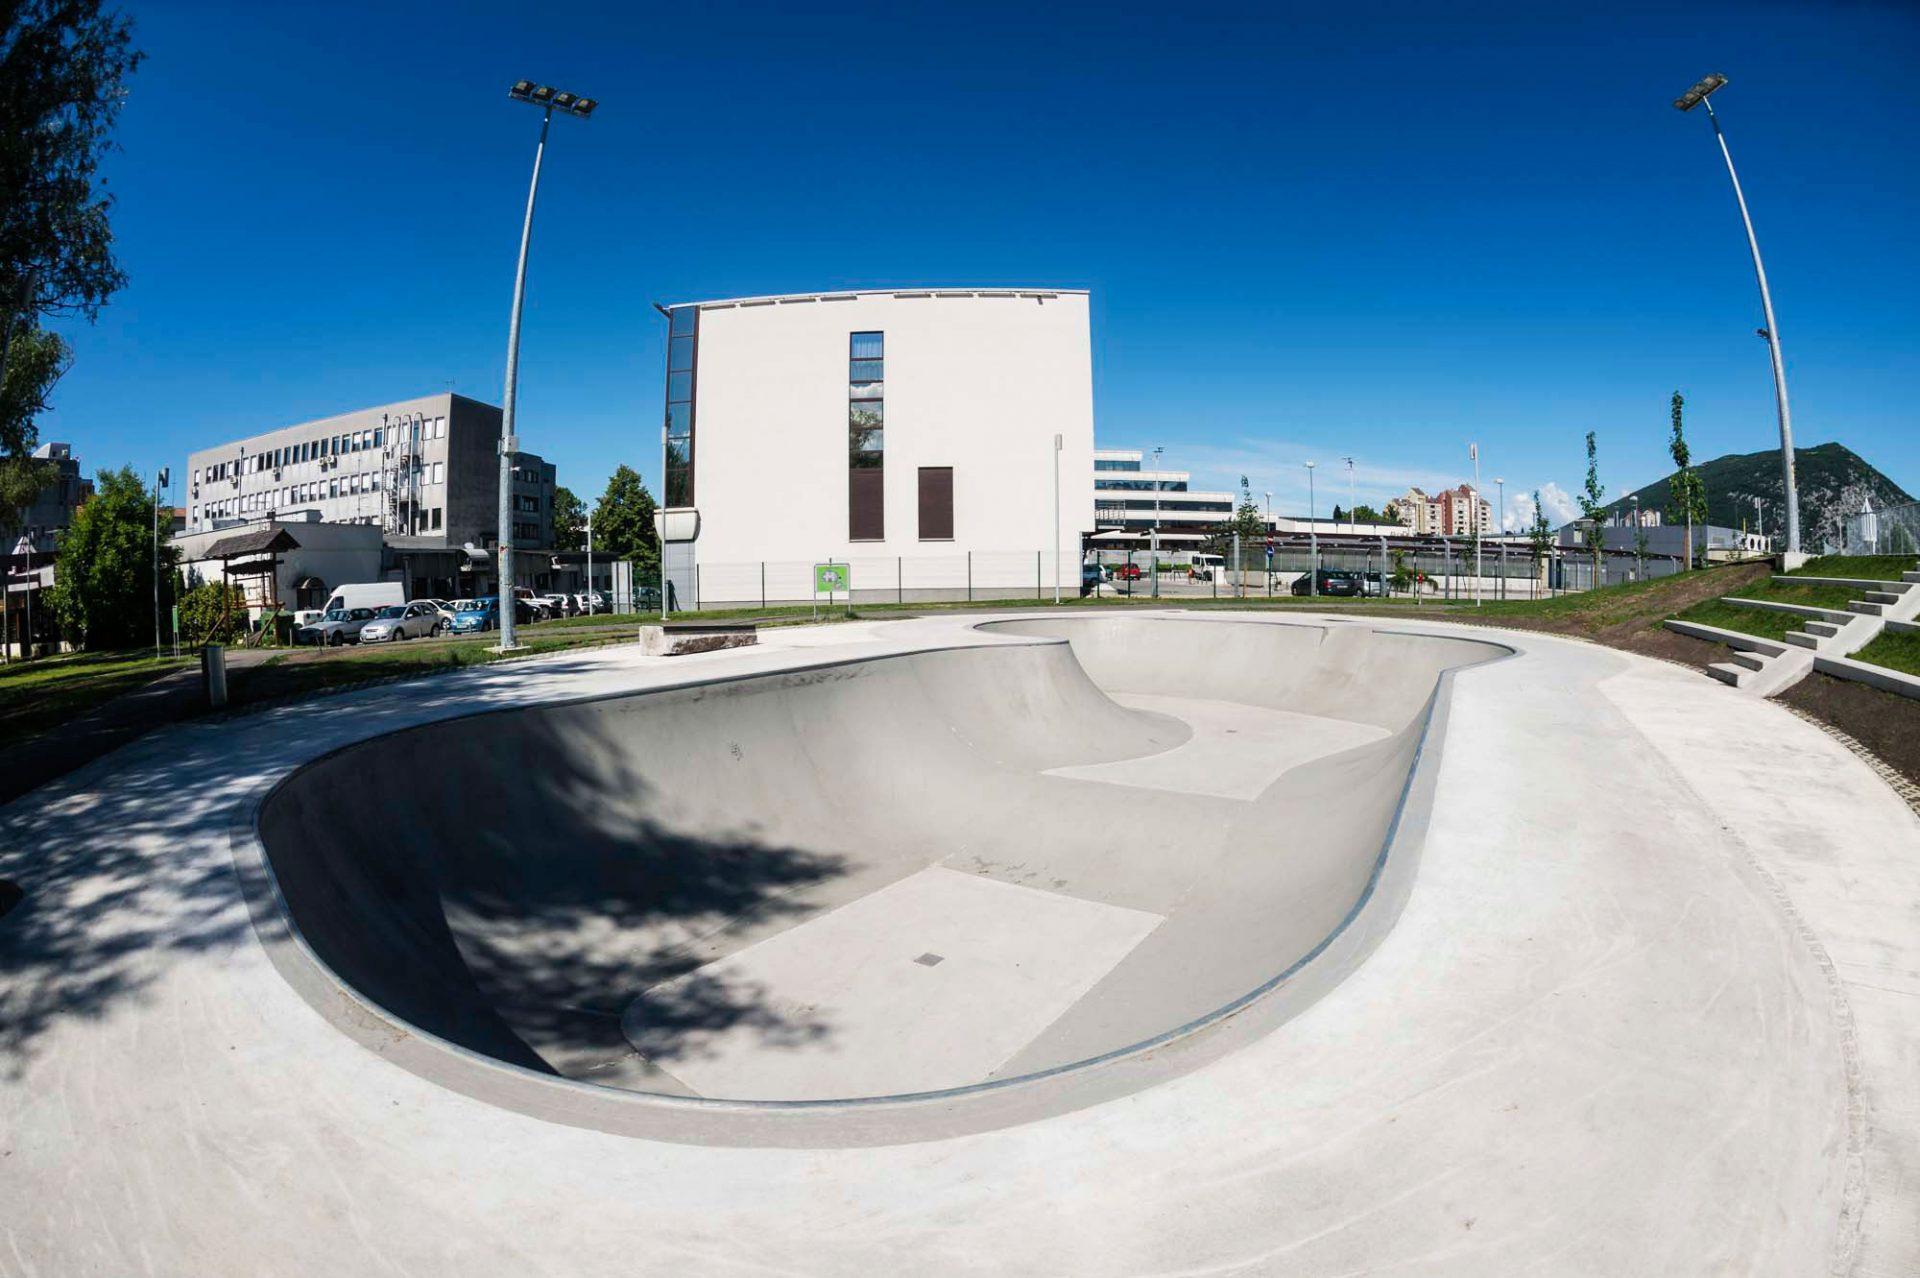 news_nova_gorika_Skate_Park_1